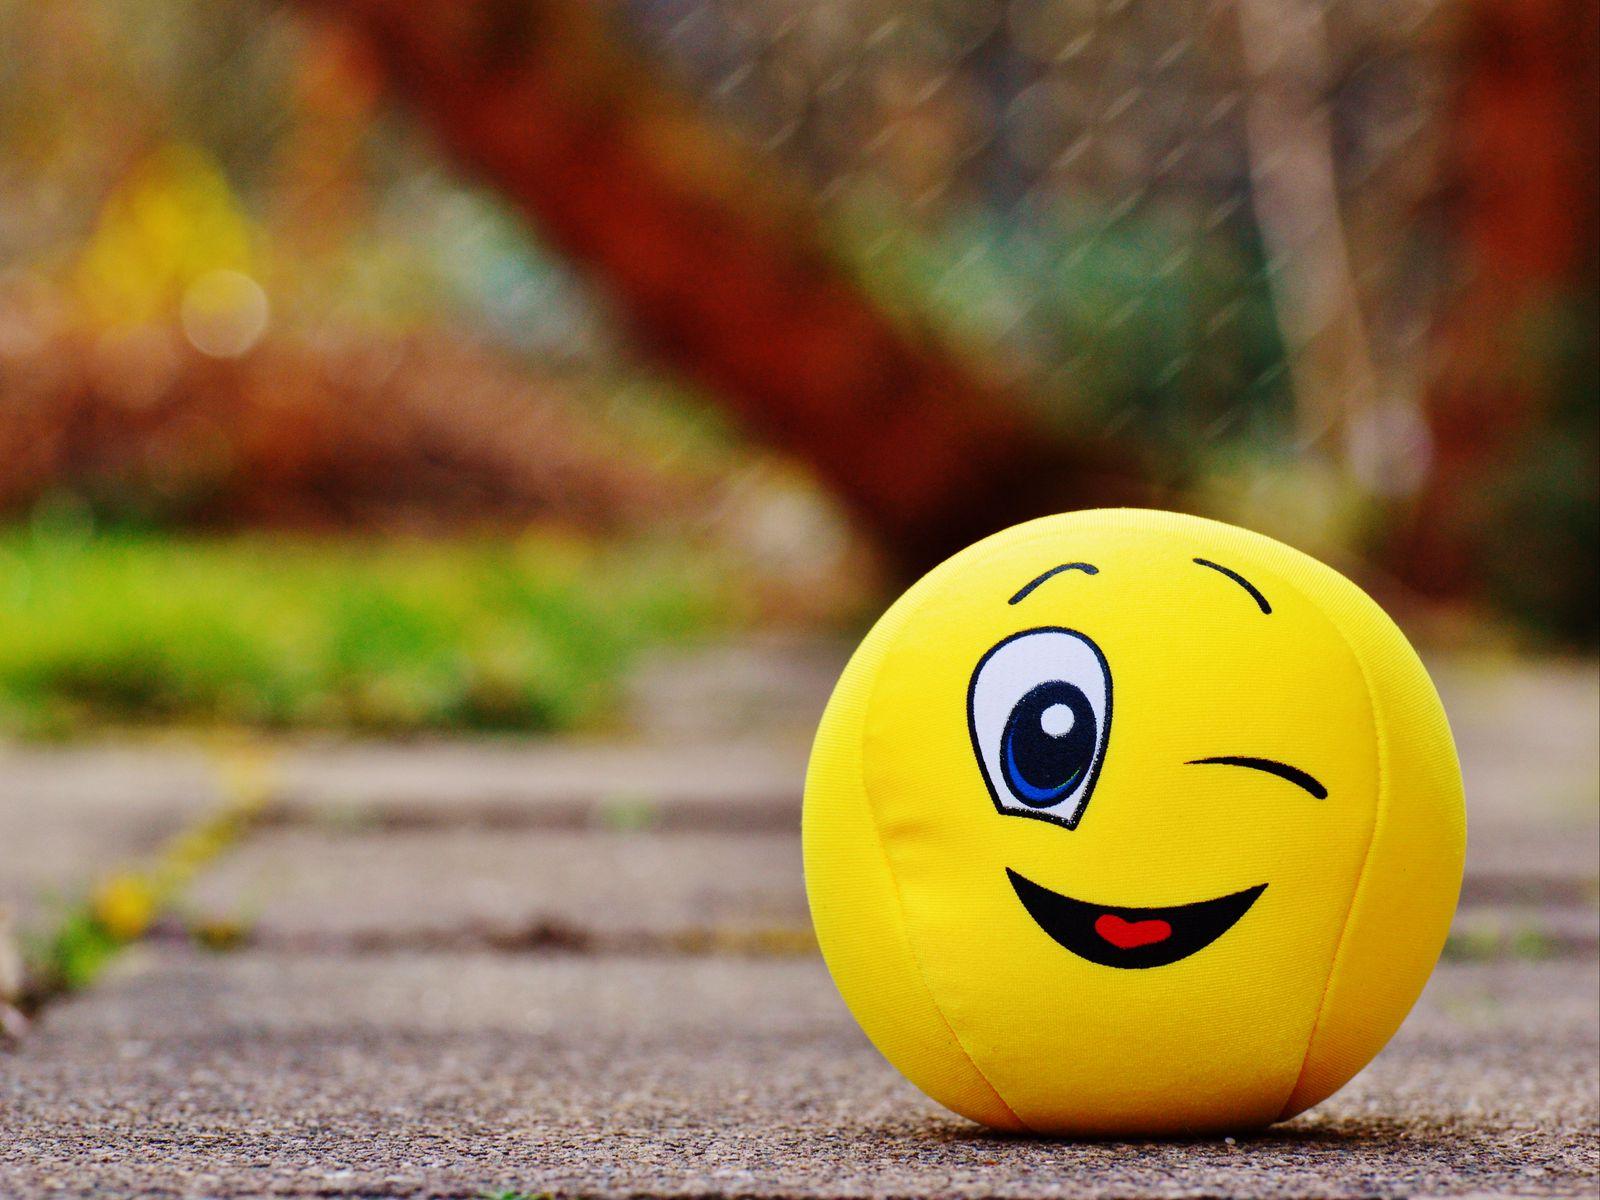 1600x1200 Wallpaper ball, smile, happy, toy